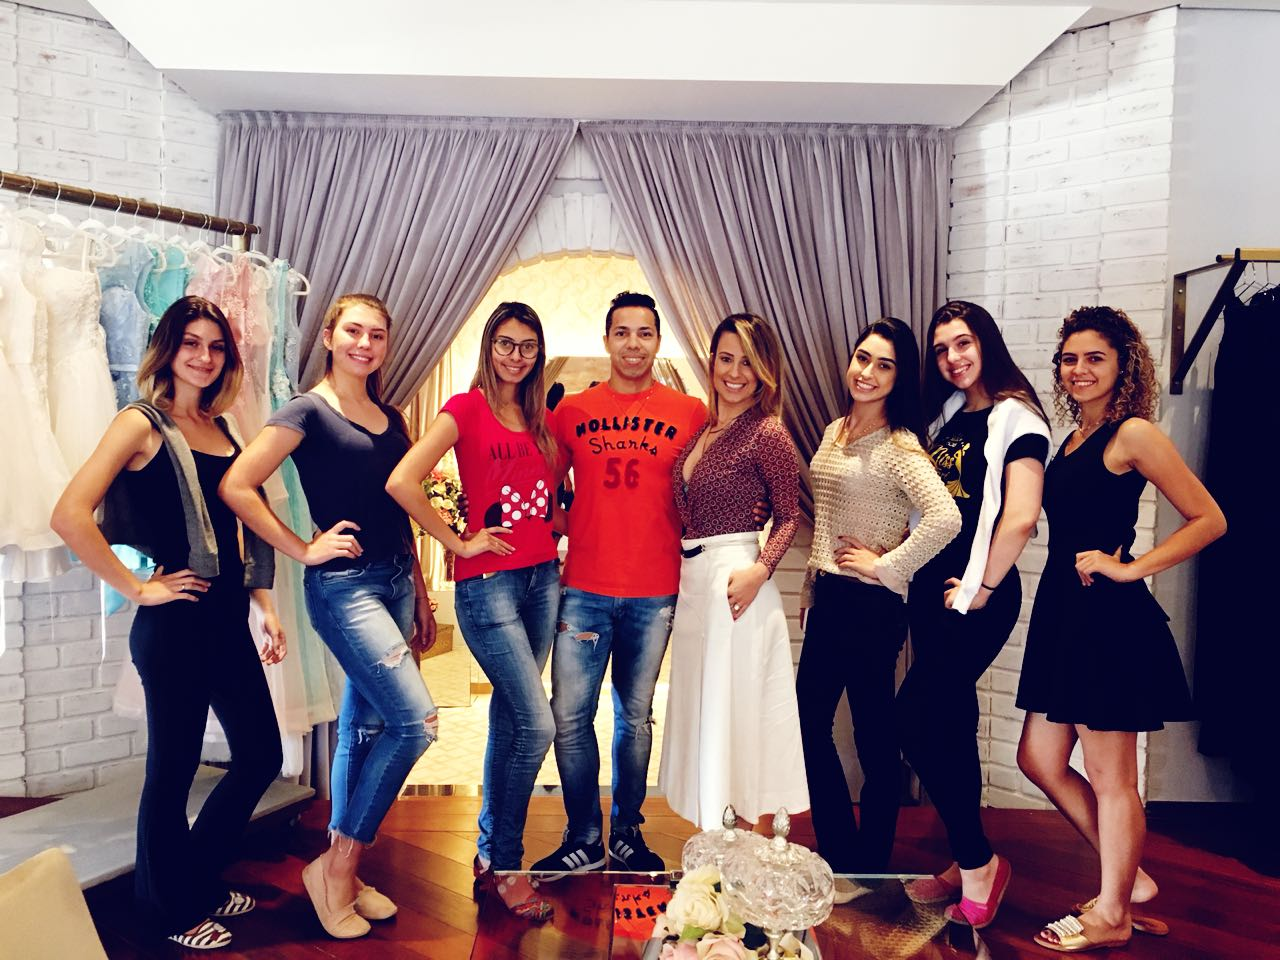 Candidatas a Miss Itararé (SP) Be Emotion 2018 realizam prova de roupas